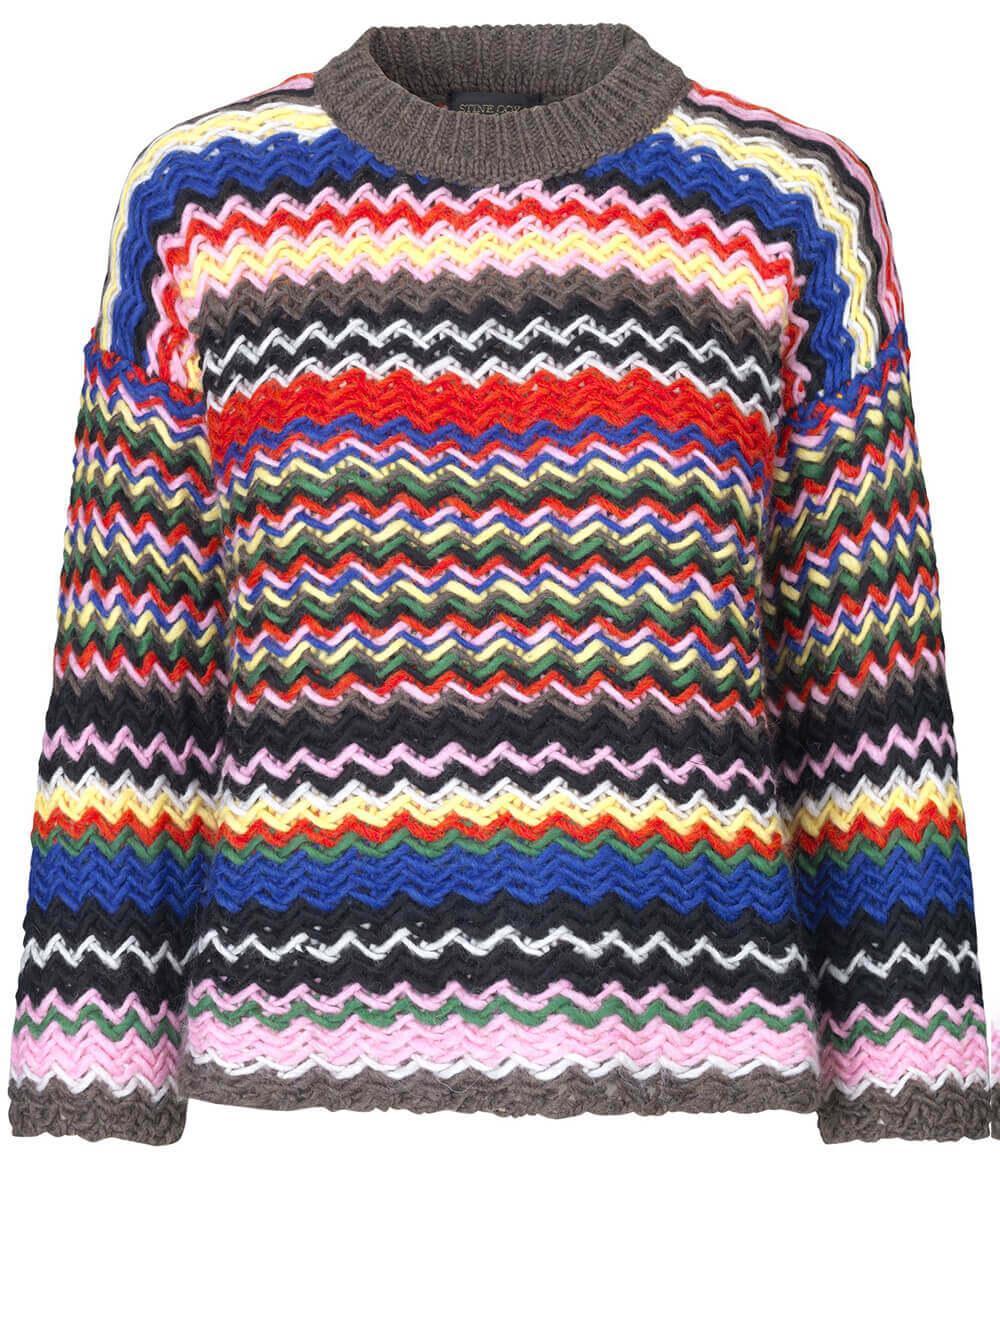 Rebeka Zig Zag Sweater Item # SG3348